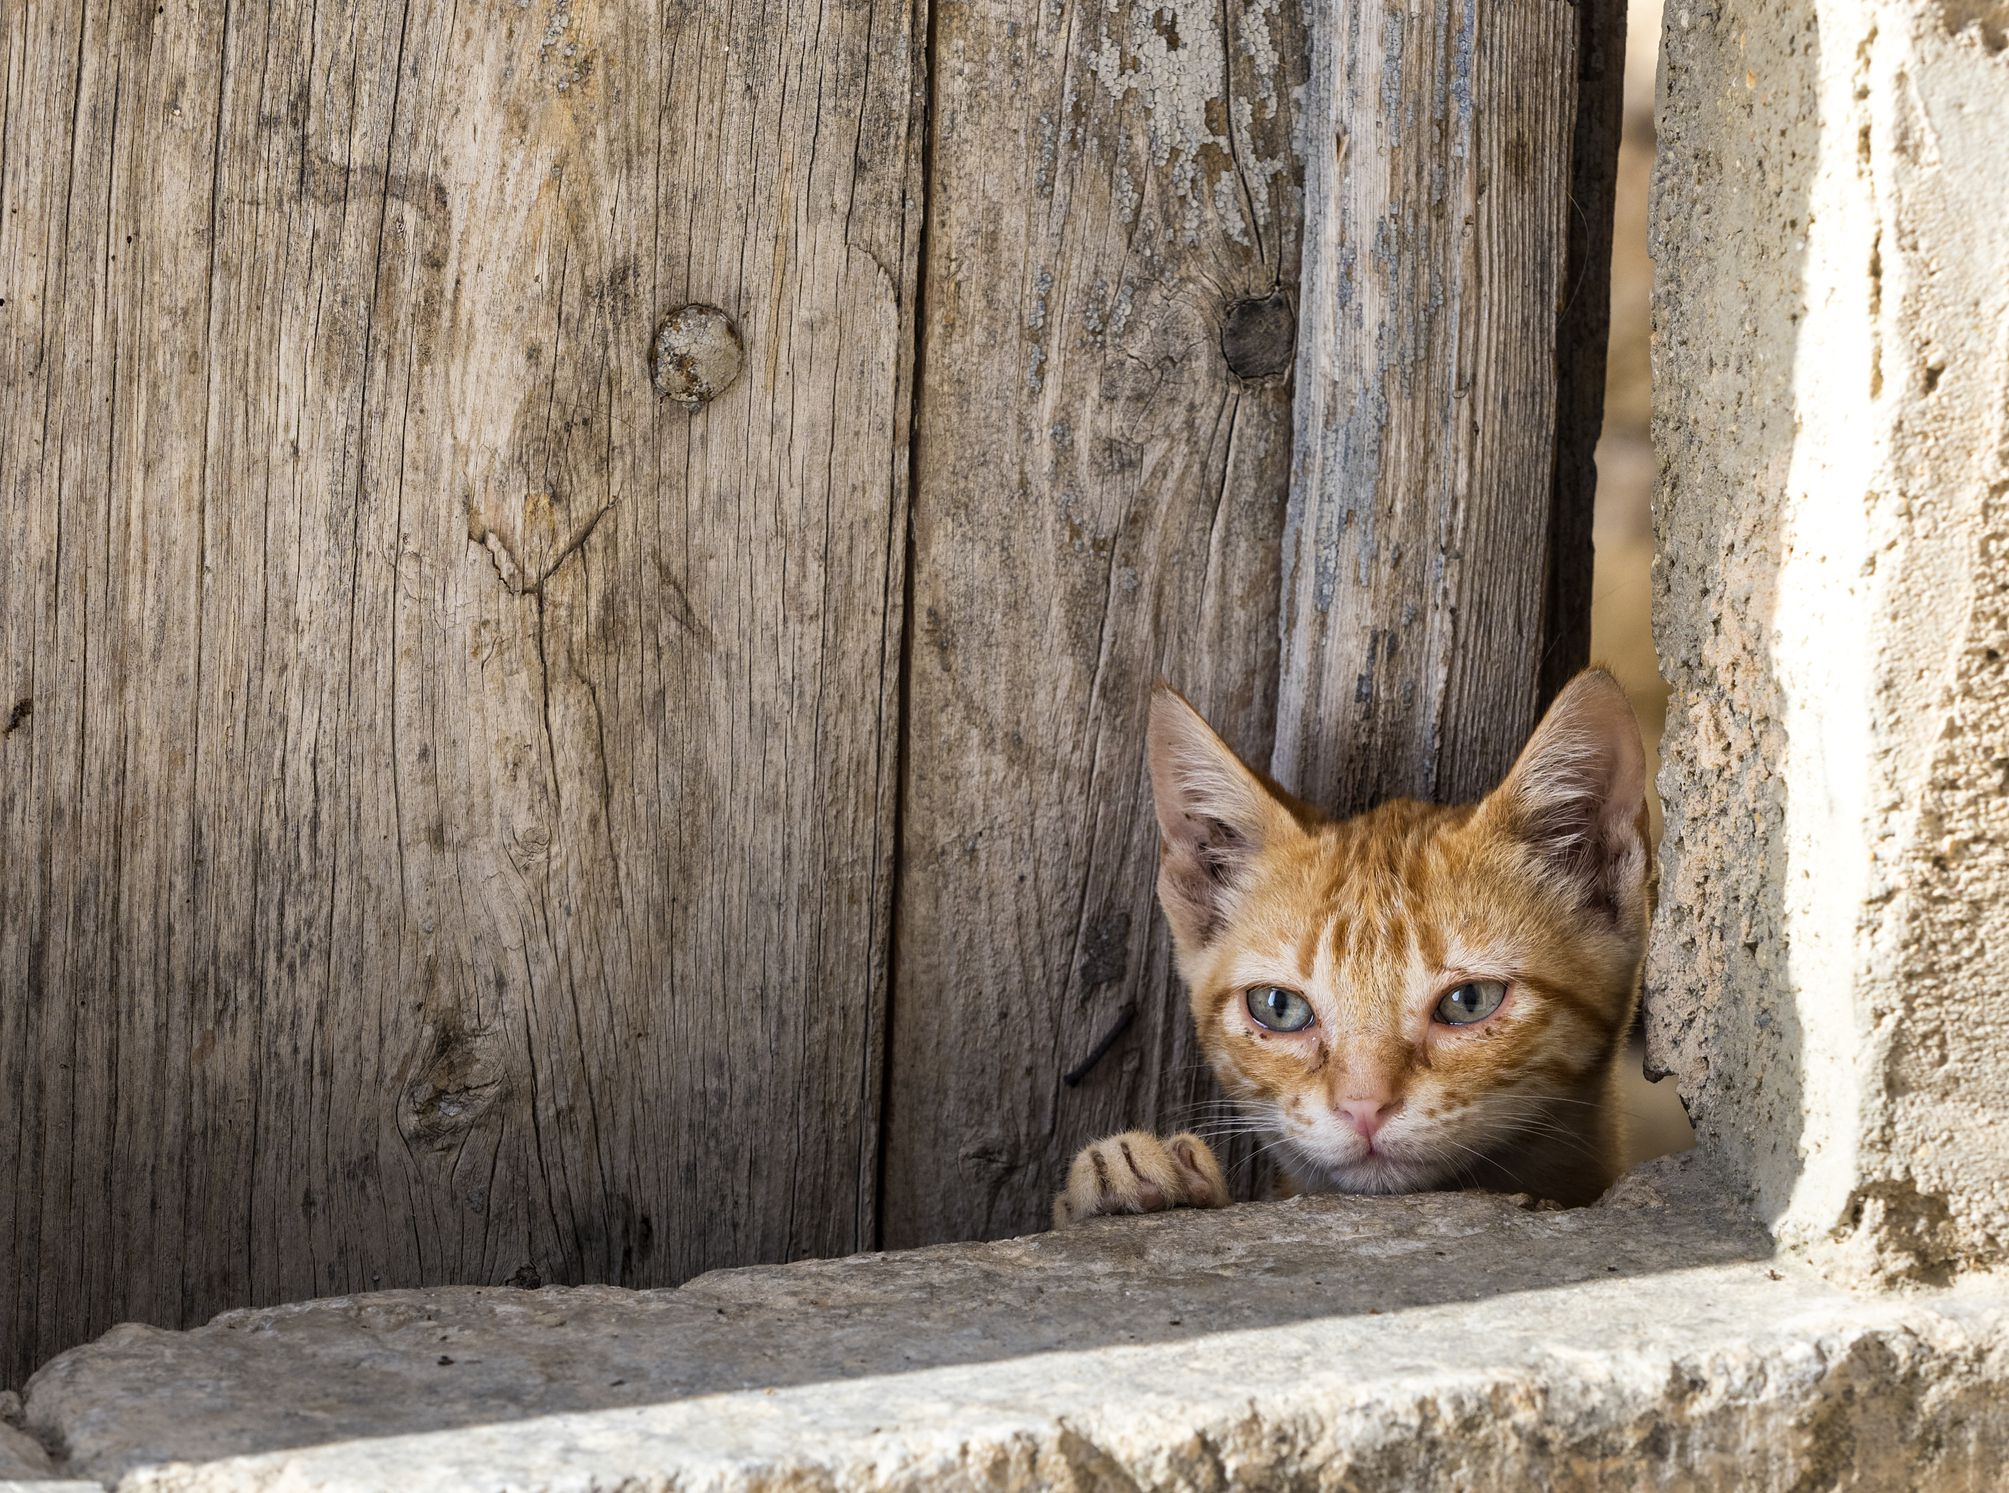 Sad street cat